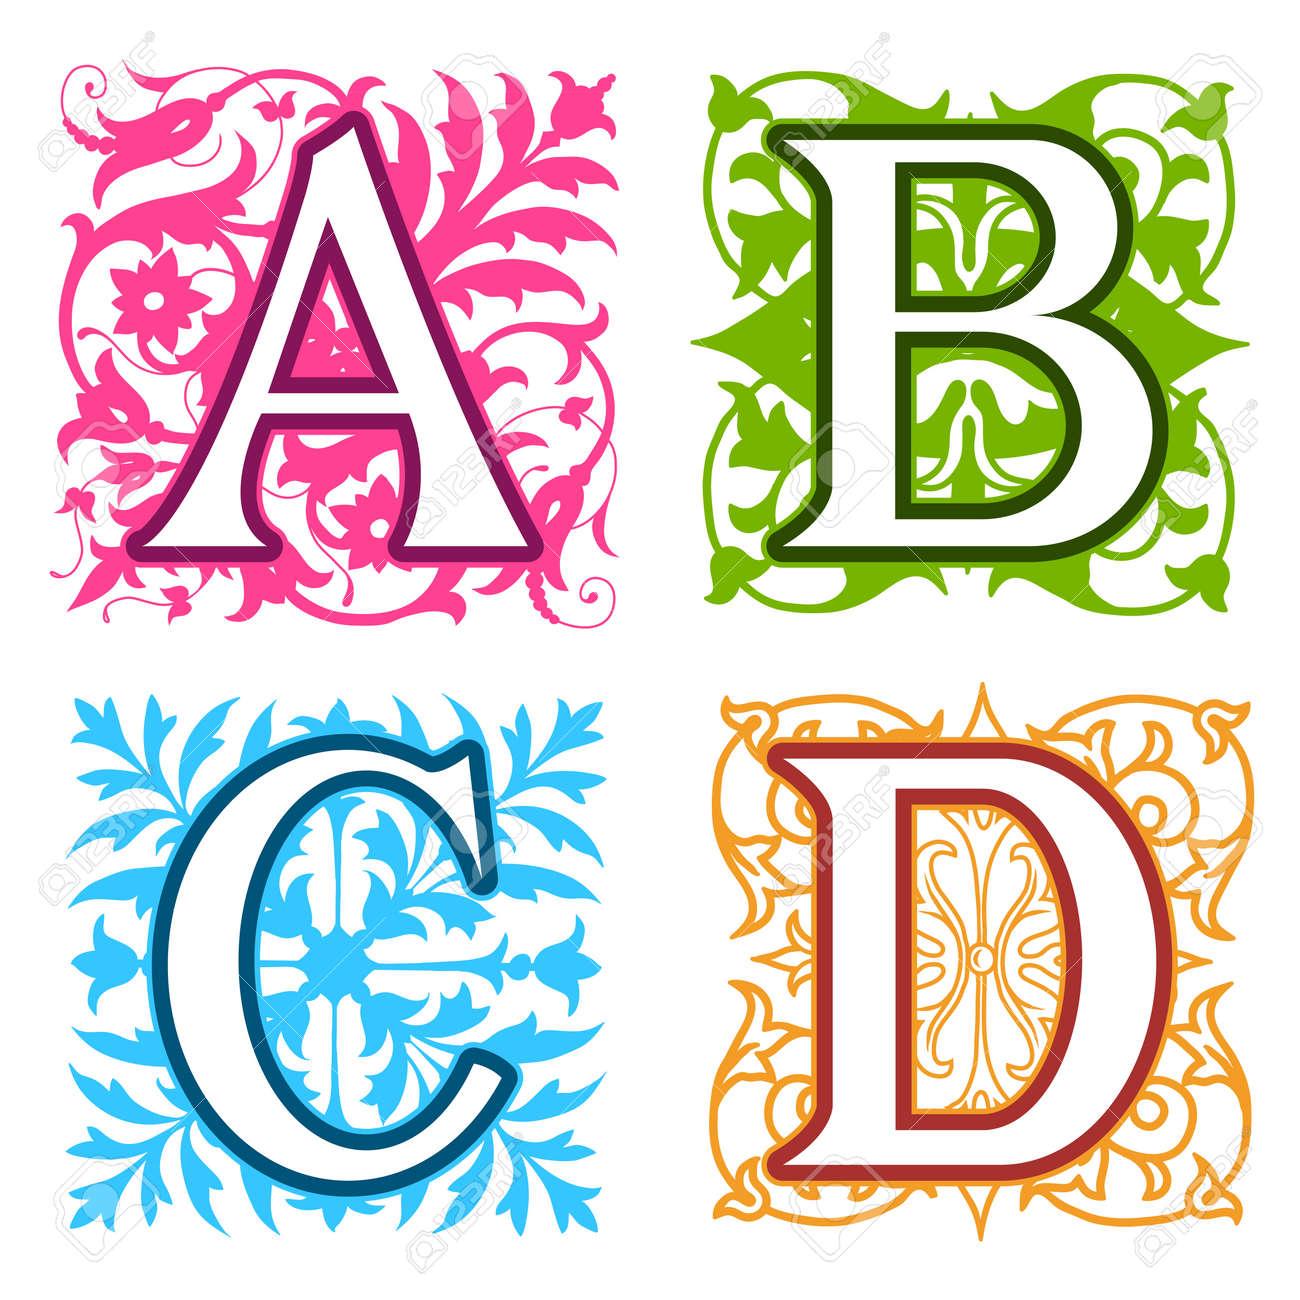 Decorative A B C D Alphabet Letters With Vintage Floral Elements In